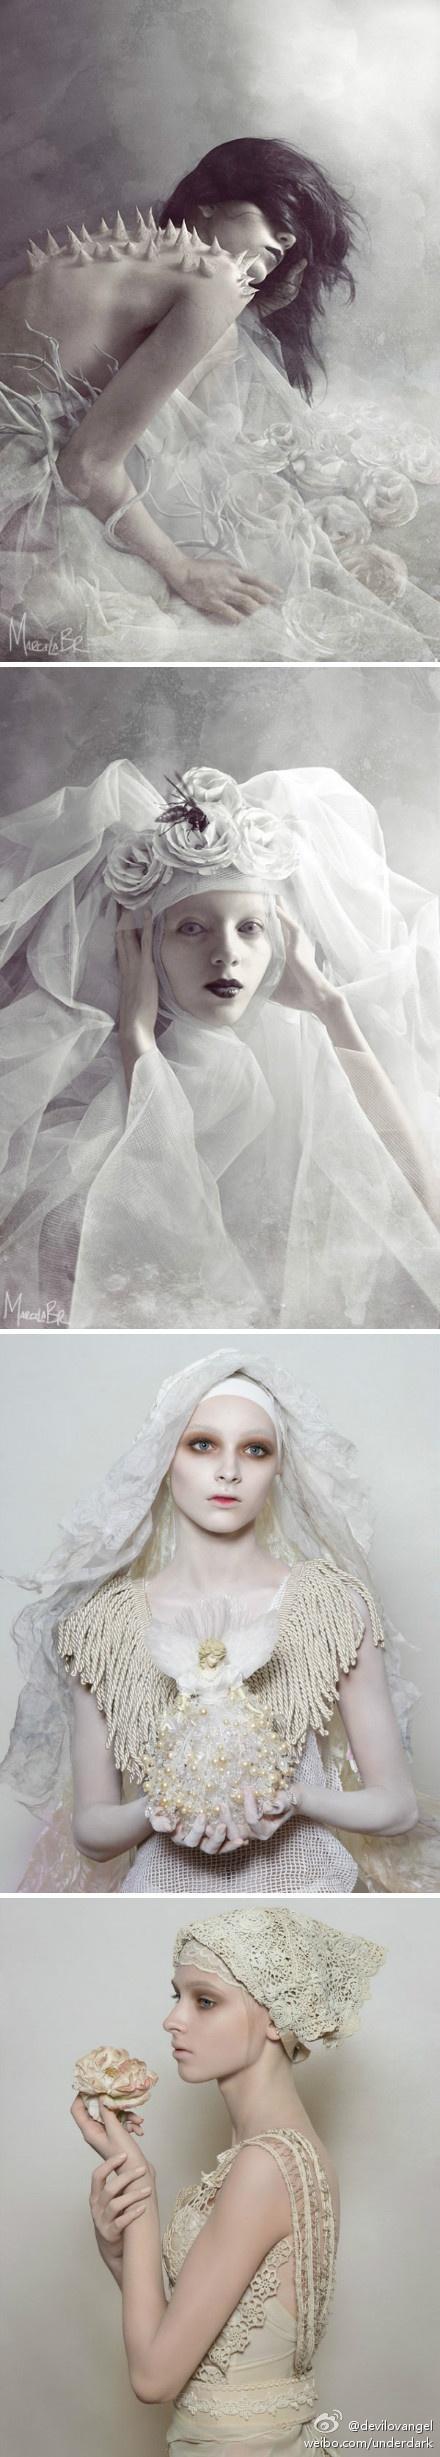 Modern Fairytale / Queen of Ice and Snow / karen cox.  white #snow queen